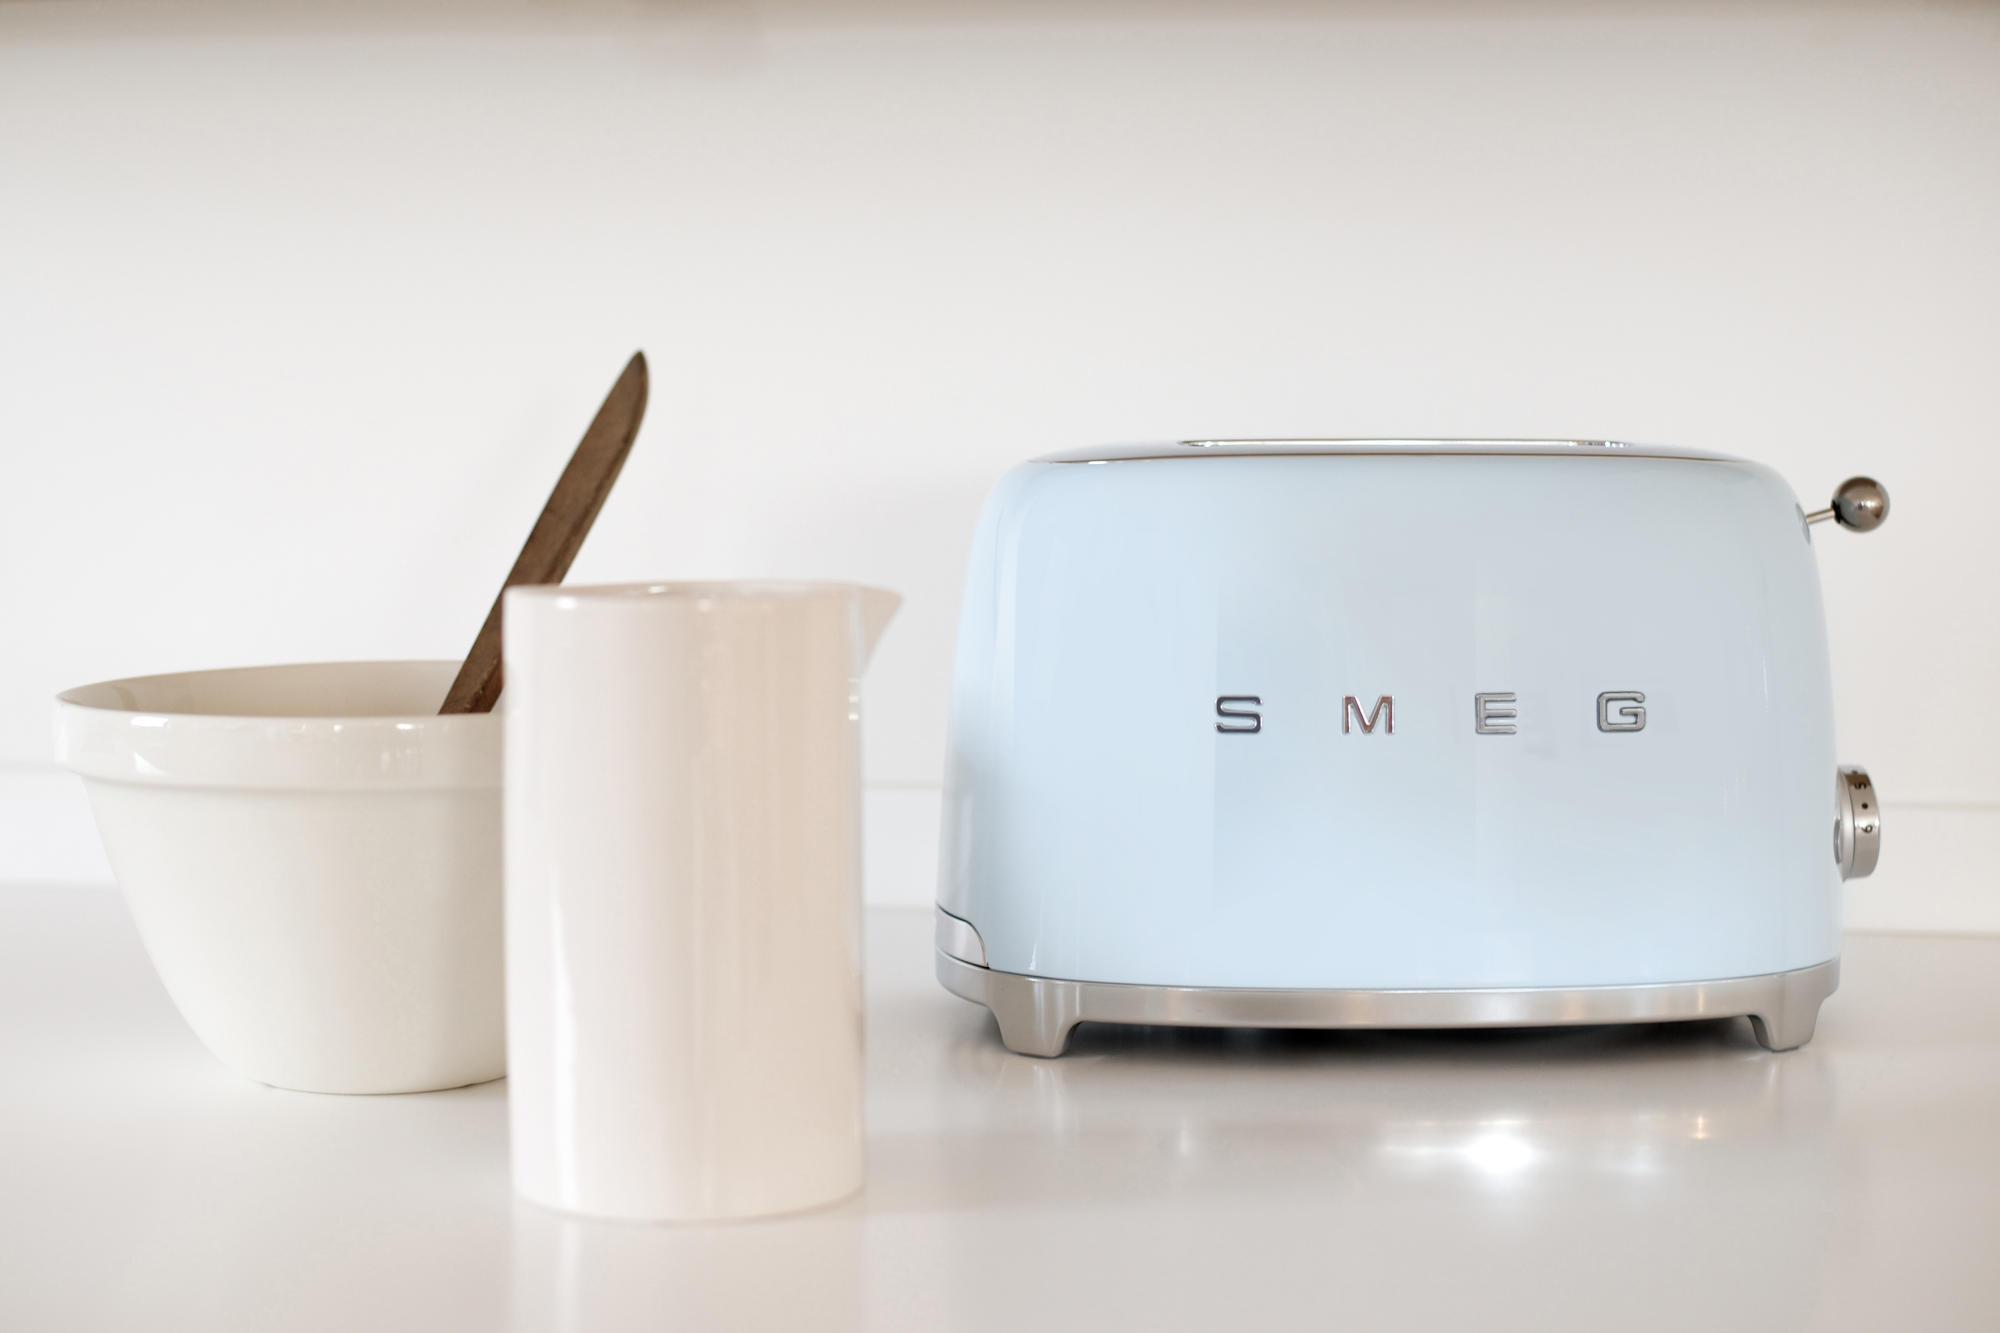 WEB_TSF01PBEU_55.jpg-smeg-toaster-retro-design-50s-60s-shop-bleywaren